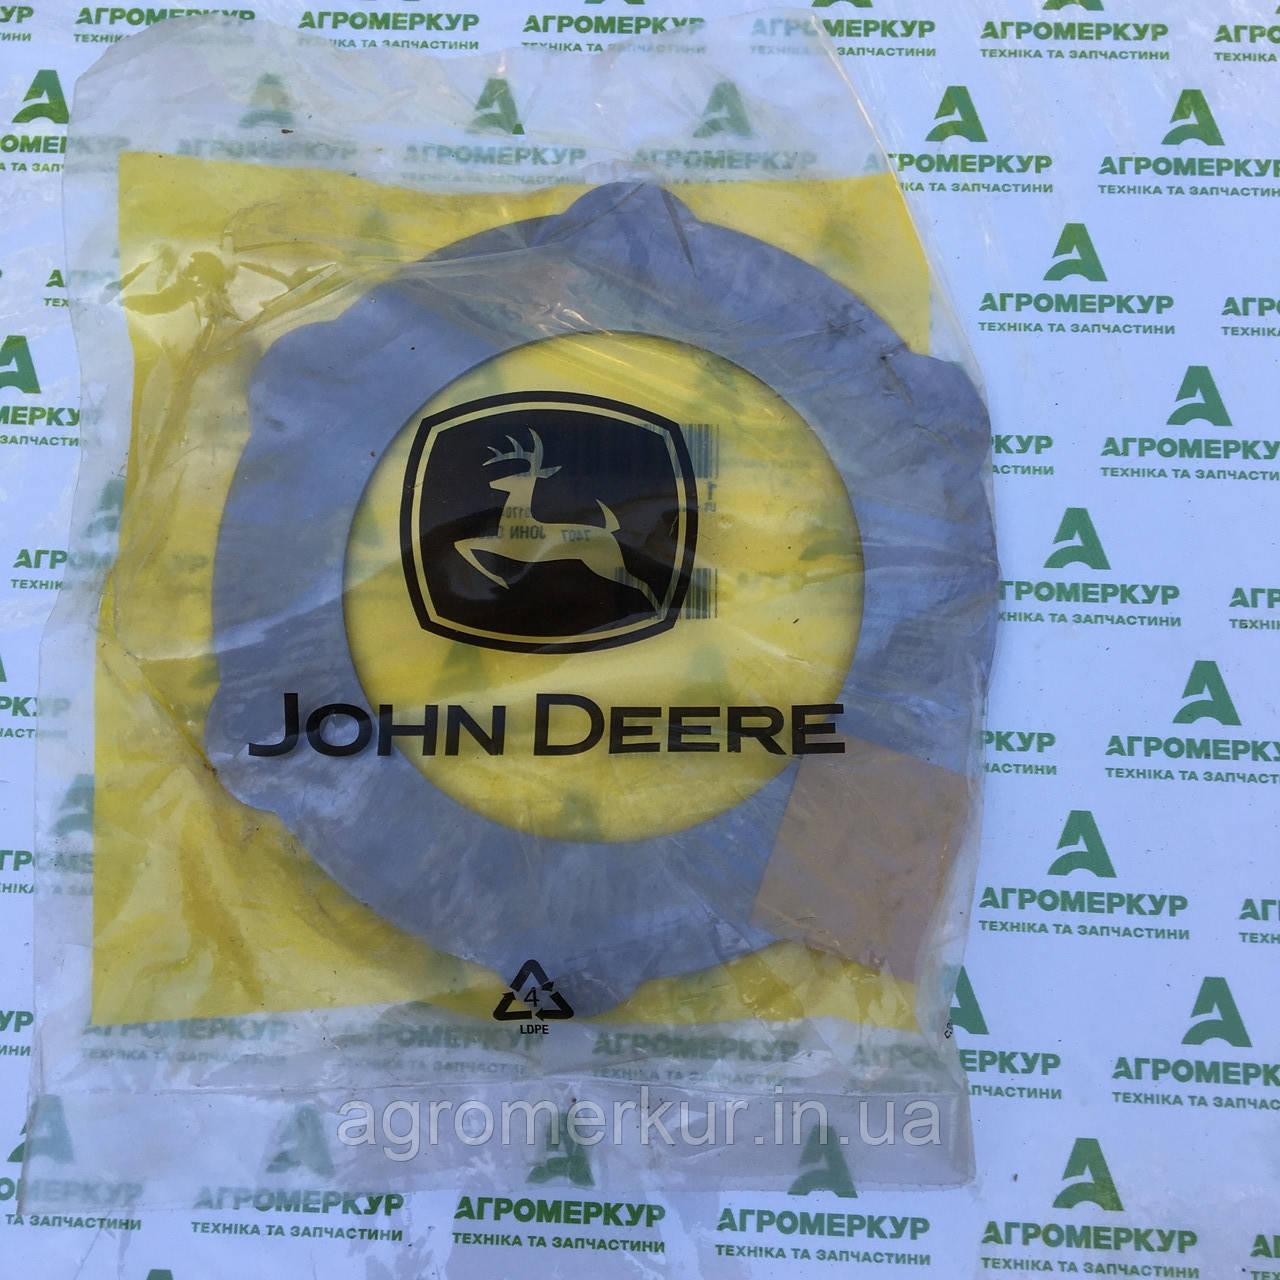 Диск муфти R108507 John Deere